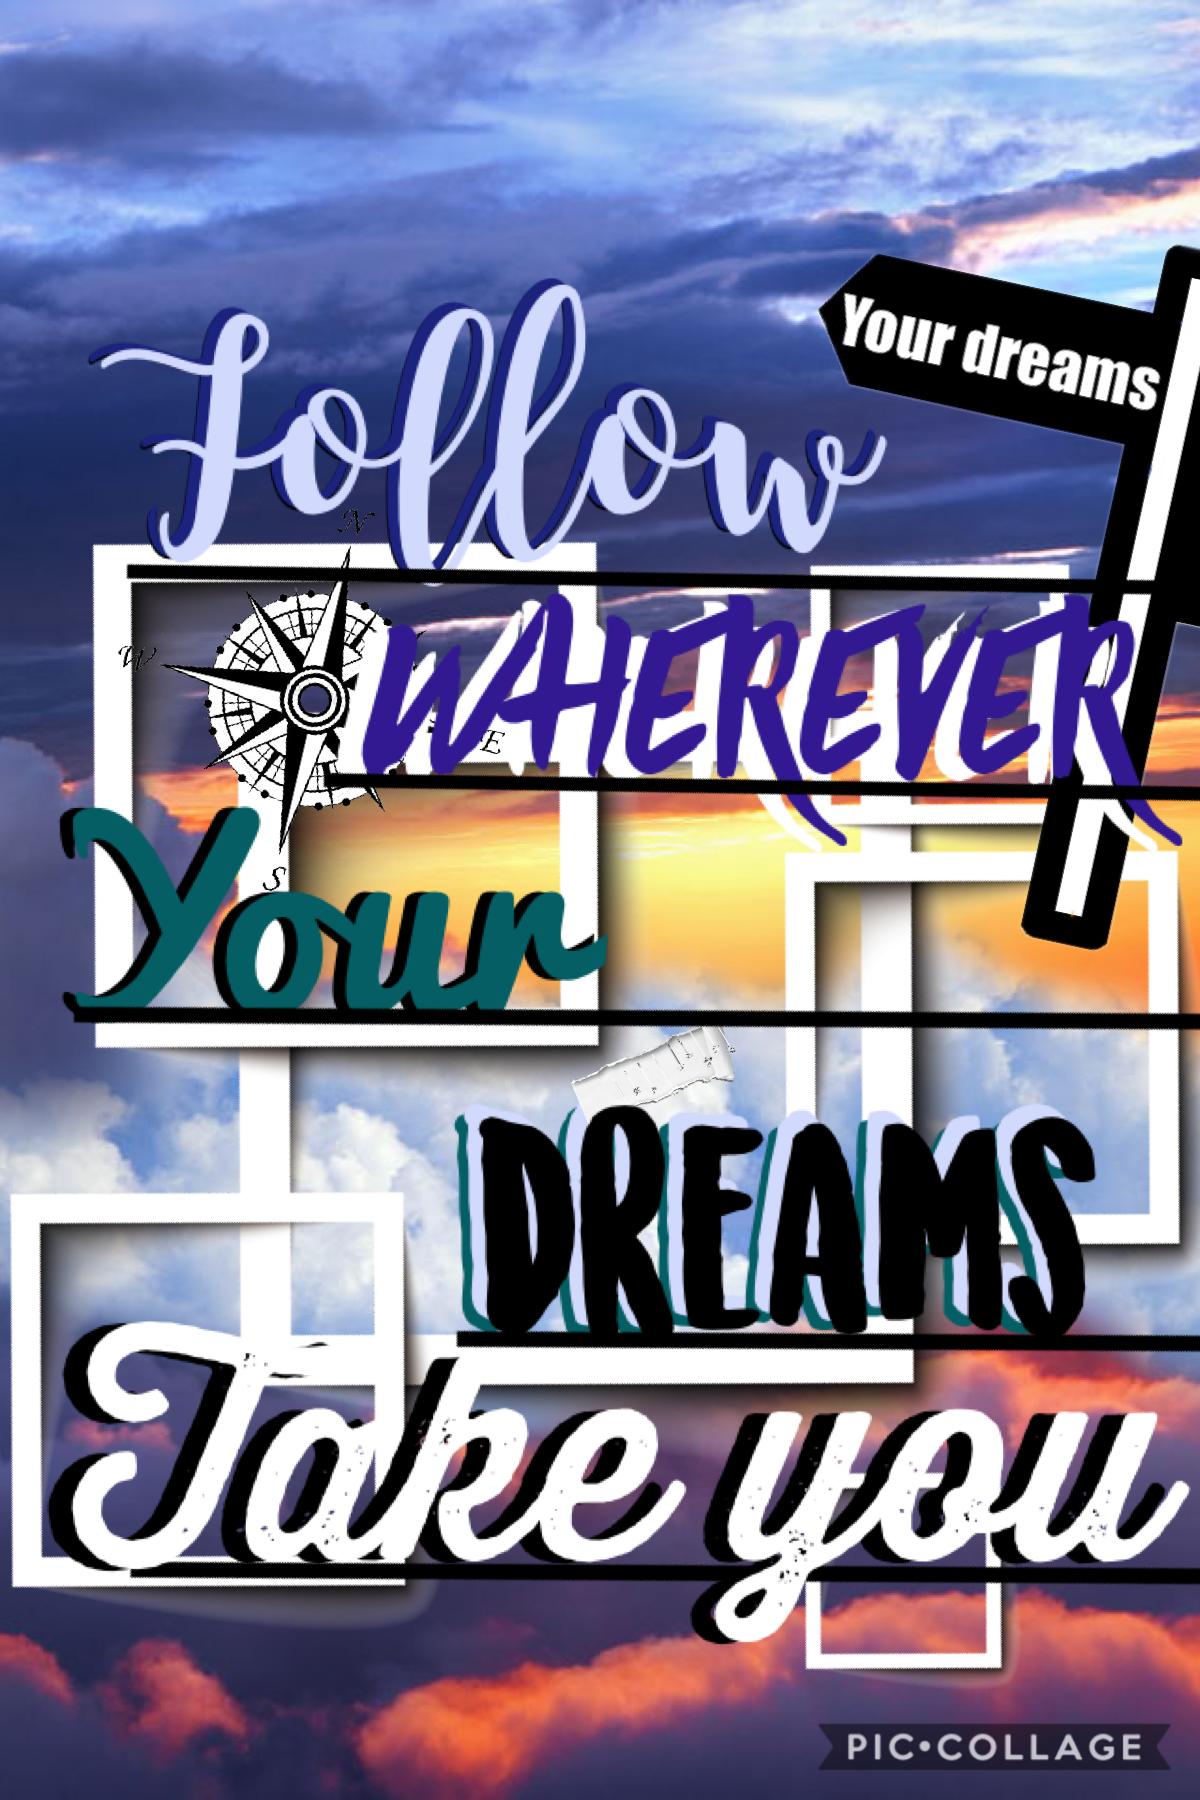 Follow wherever your dreams take you